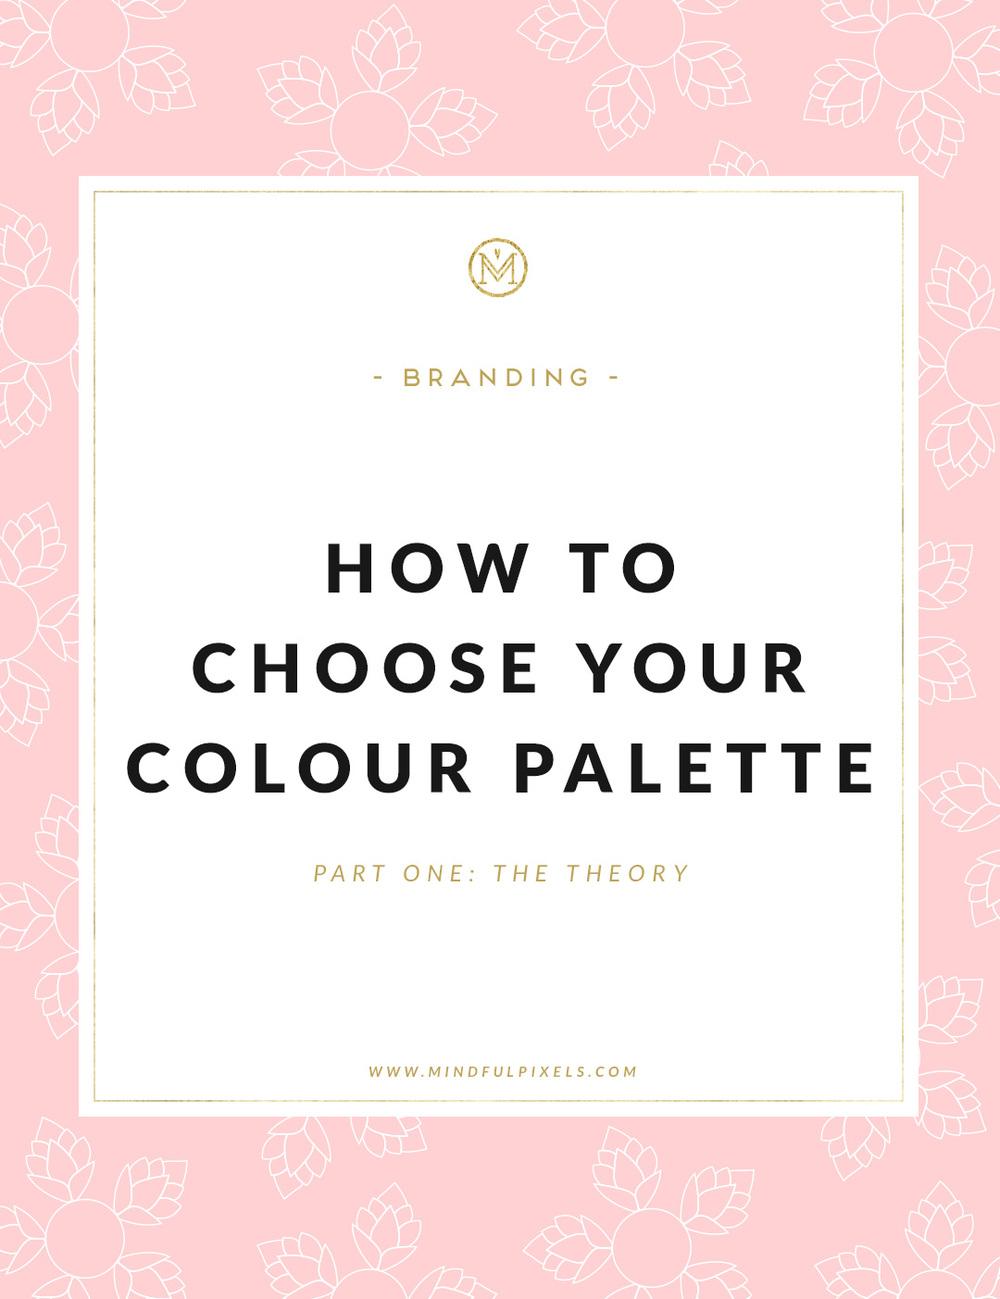 Choose-your-colour-palette-cover.jpg